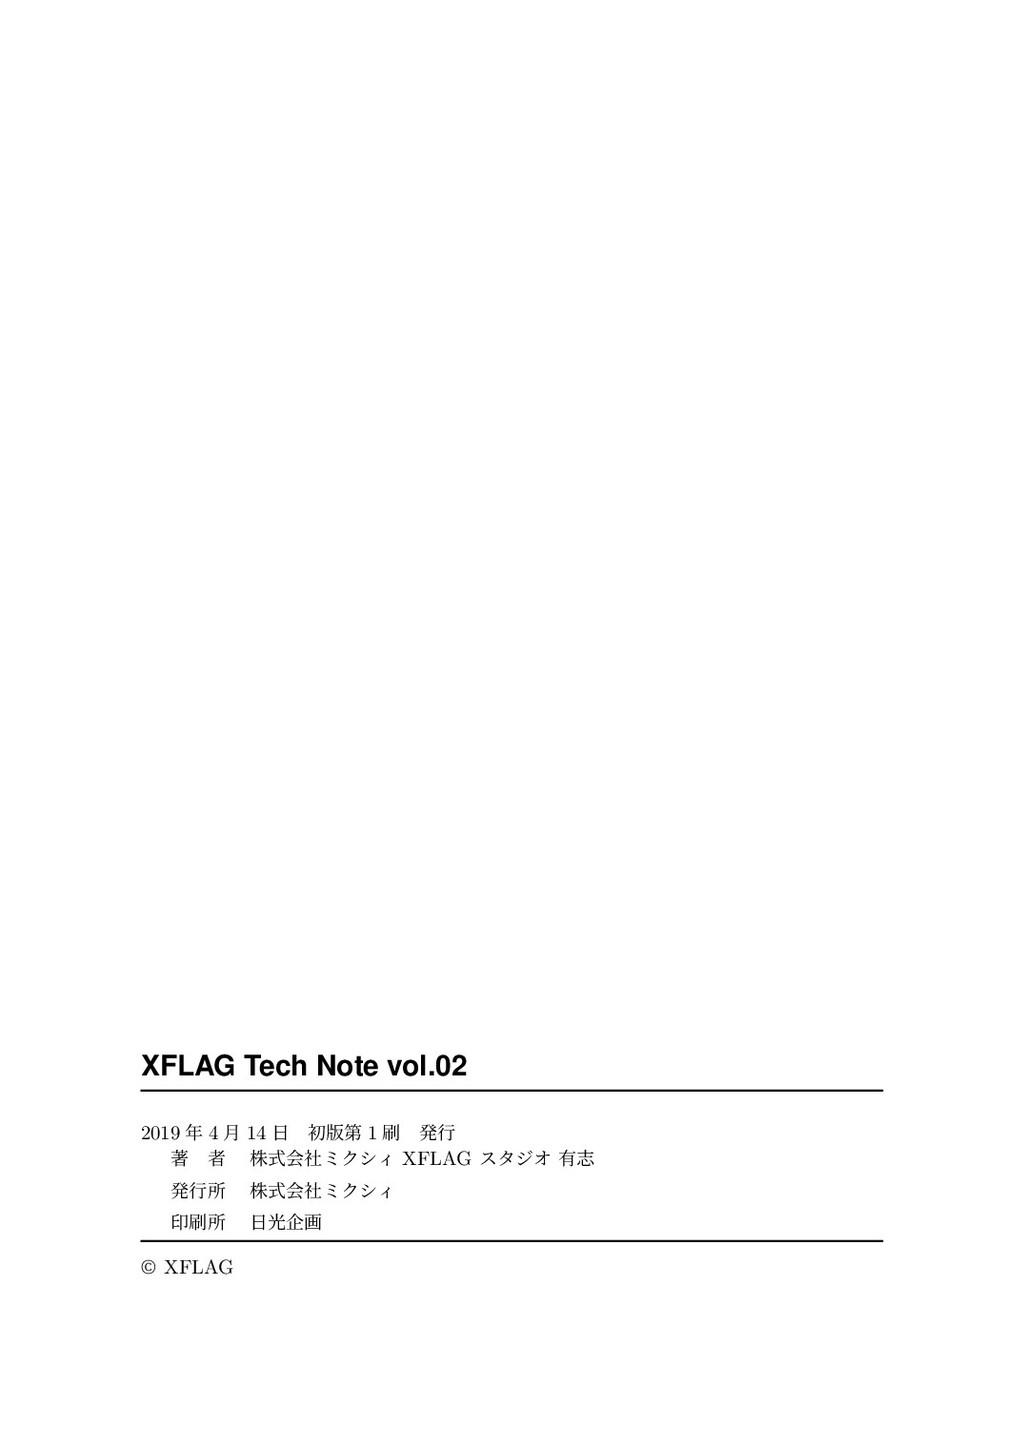 XFLAG Tech Note vol.02 2019 年 4 ⽉ 14 ⽇初版第 1 刷...